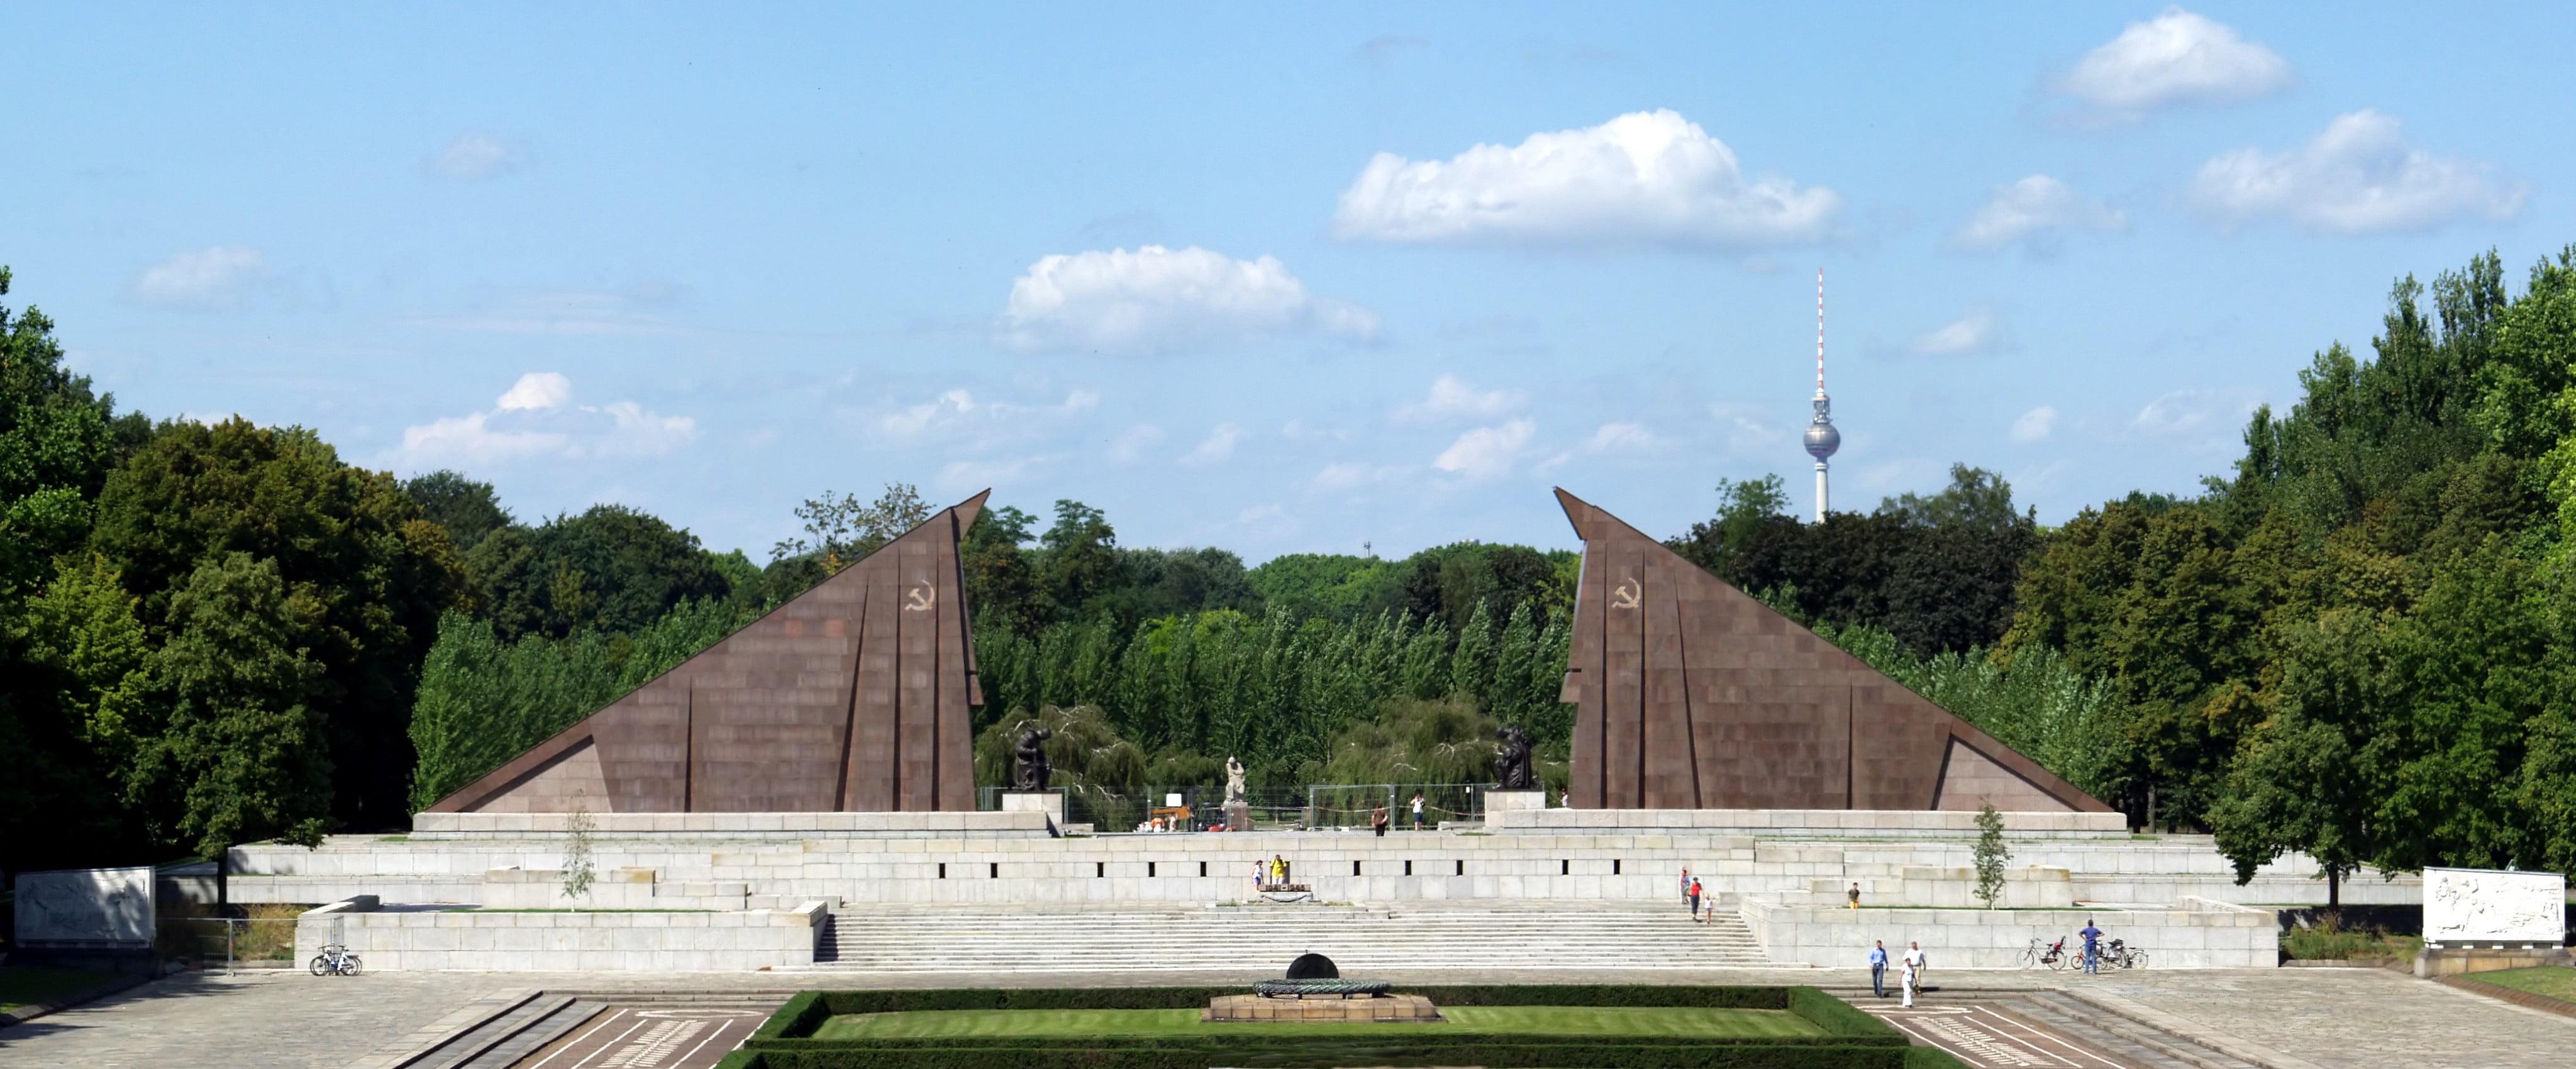 Sowjetisches Ehrenmal (Soviet War Memorial), Treptower Park, Berlin, Raimond Spekking